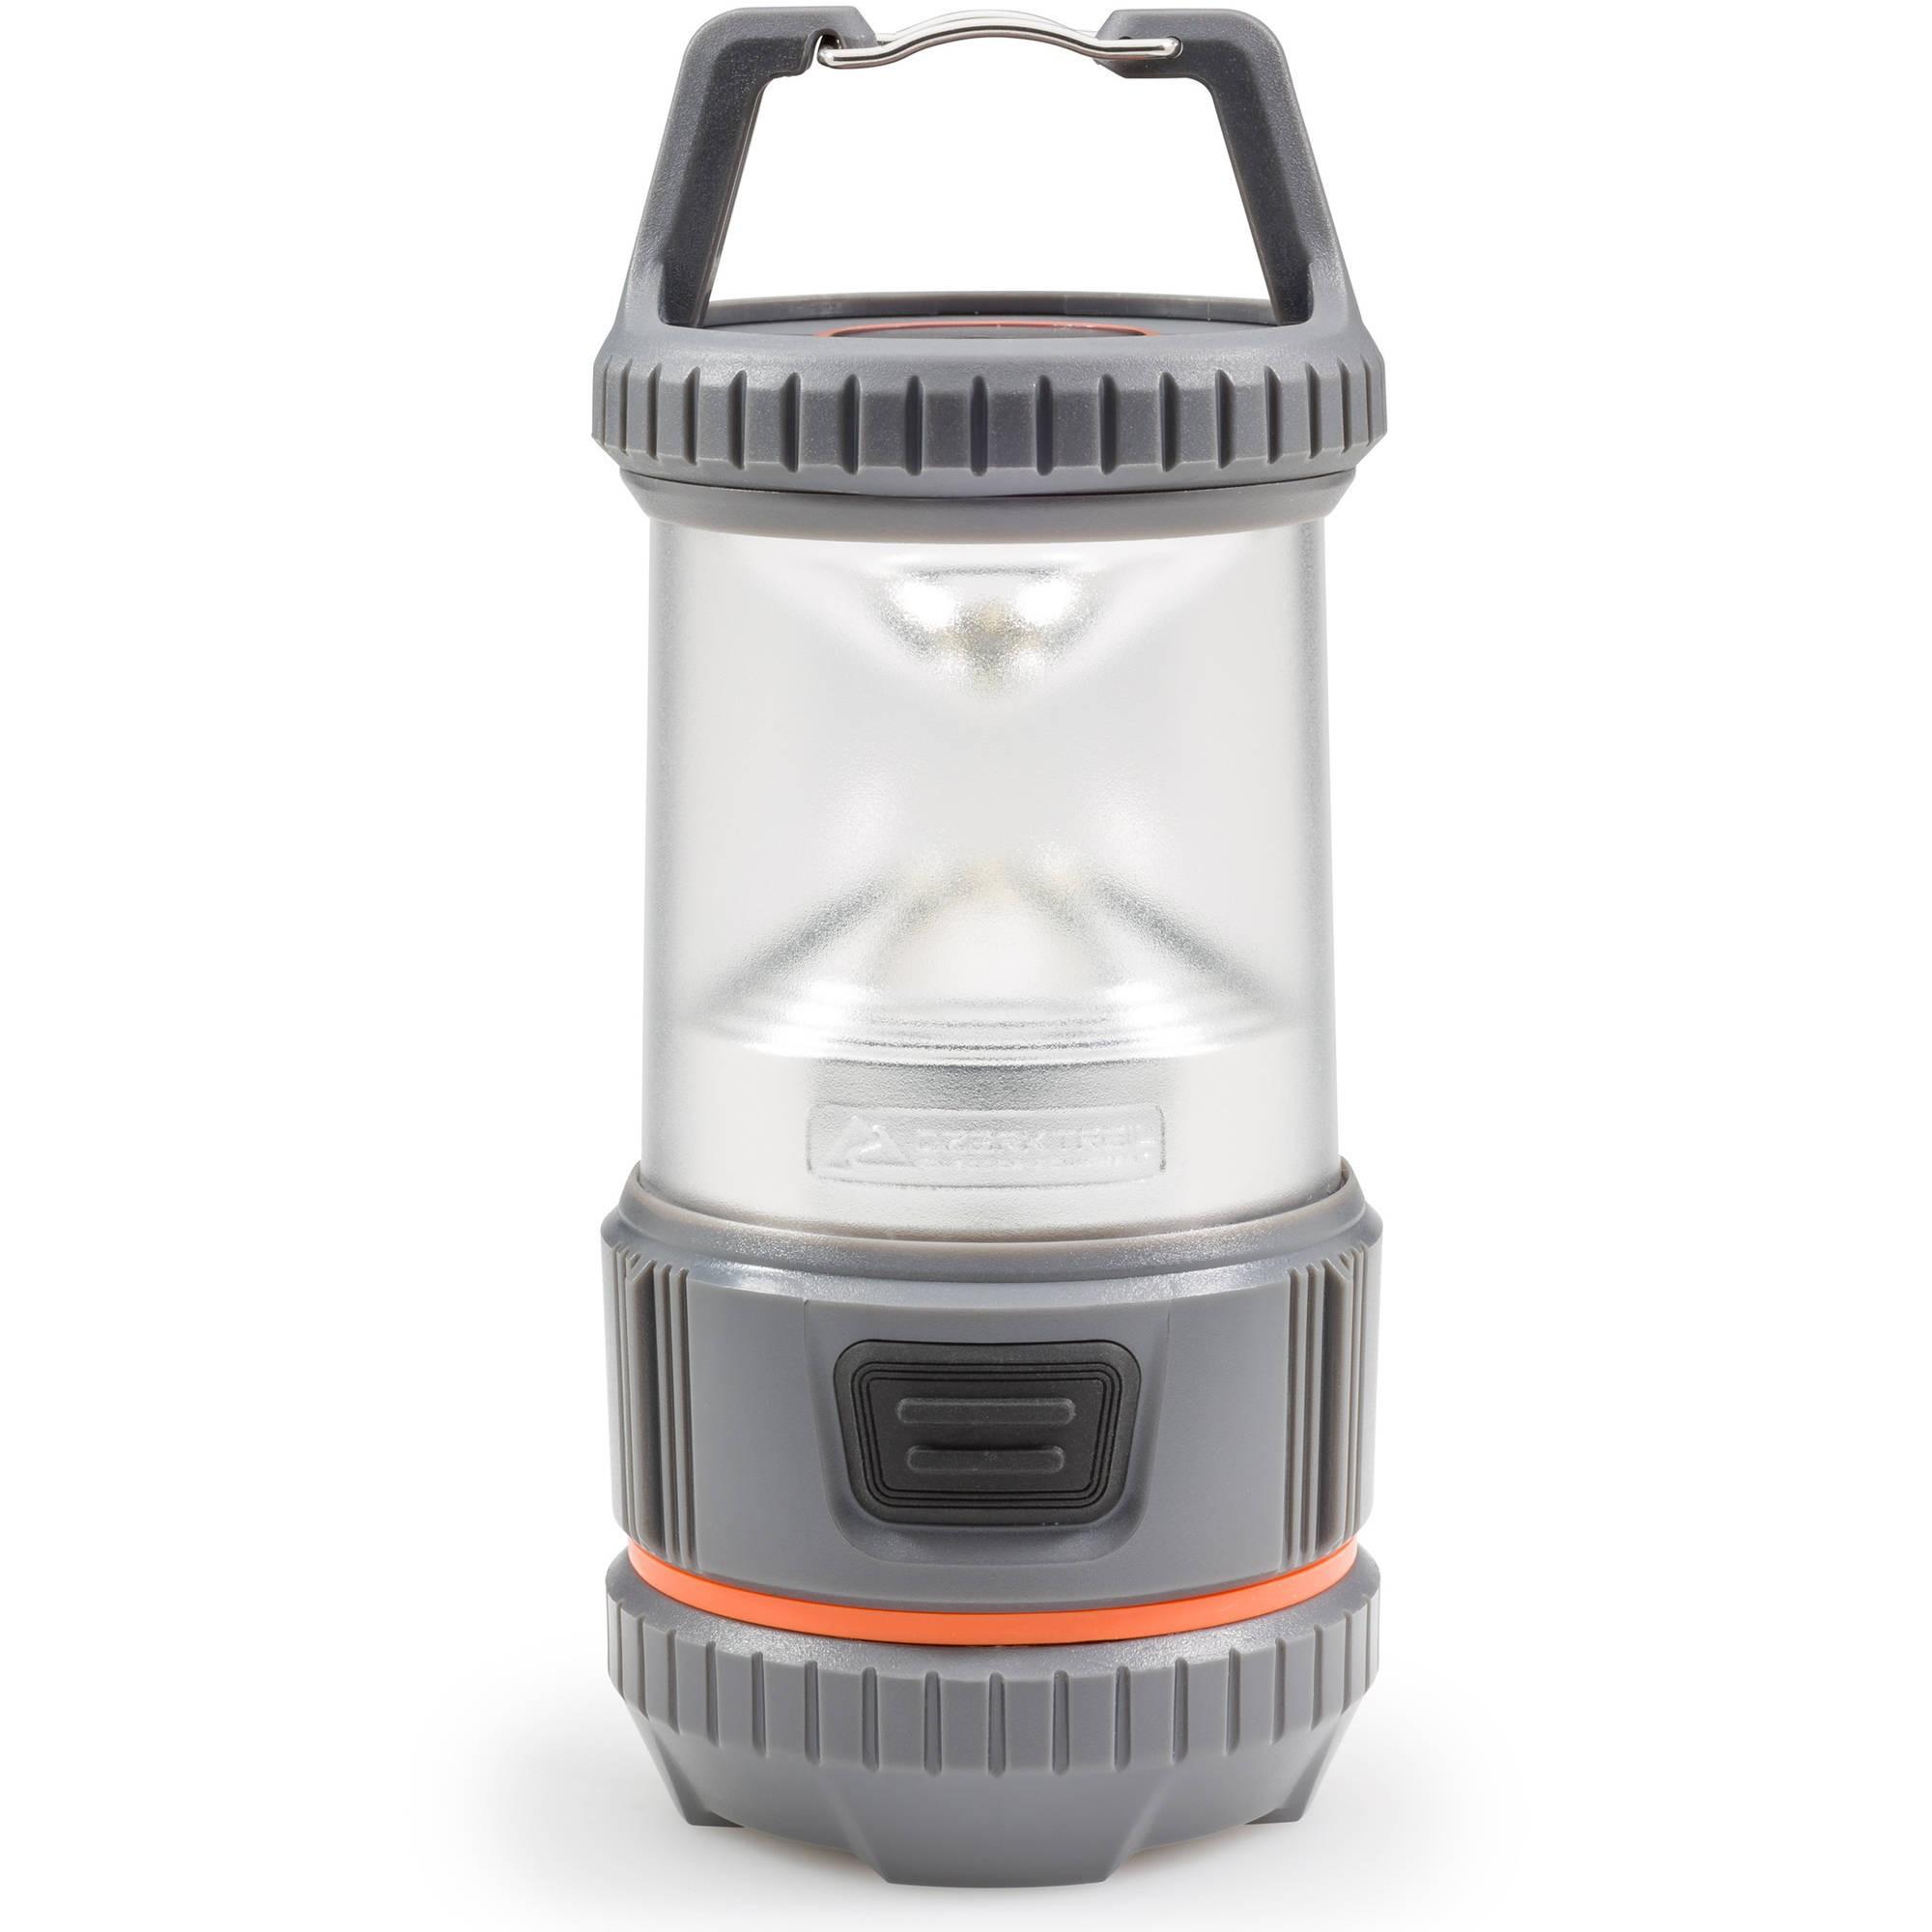 Fluorescent Light Fixture Parts Diagram Ozark Trail 100 Lumen Lantern with Carabiner Handle Walmart Of Fluorescent Light Fixture Parts Diagram